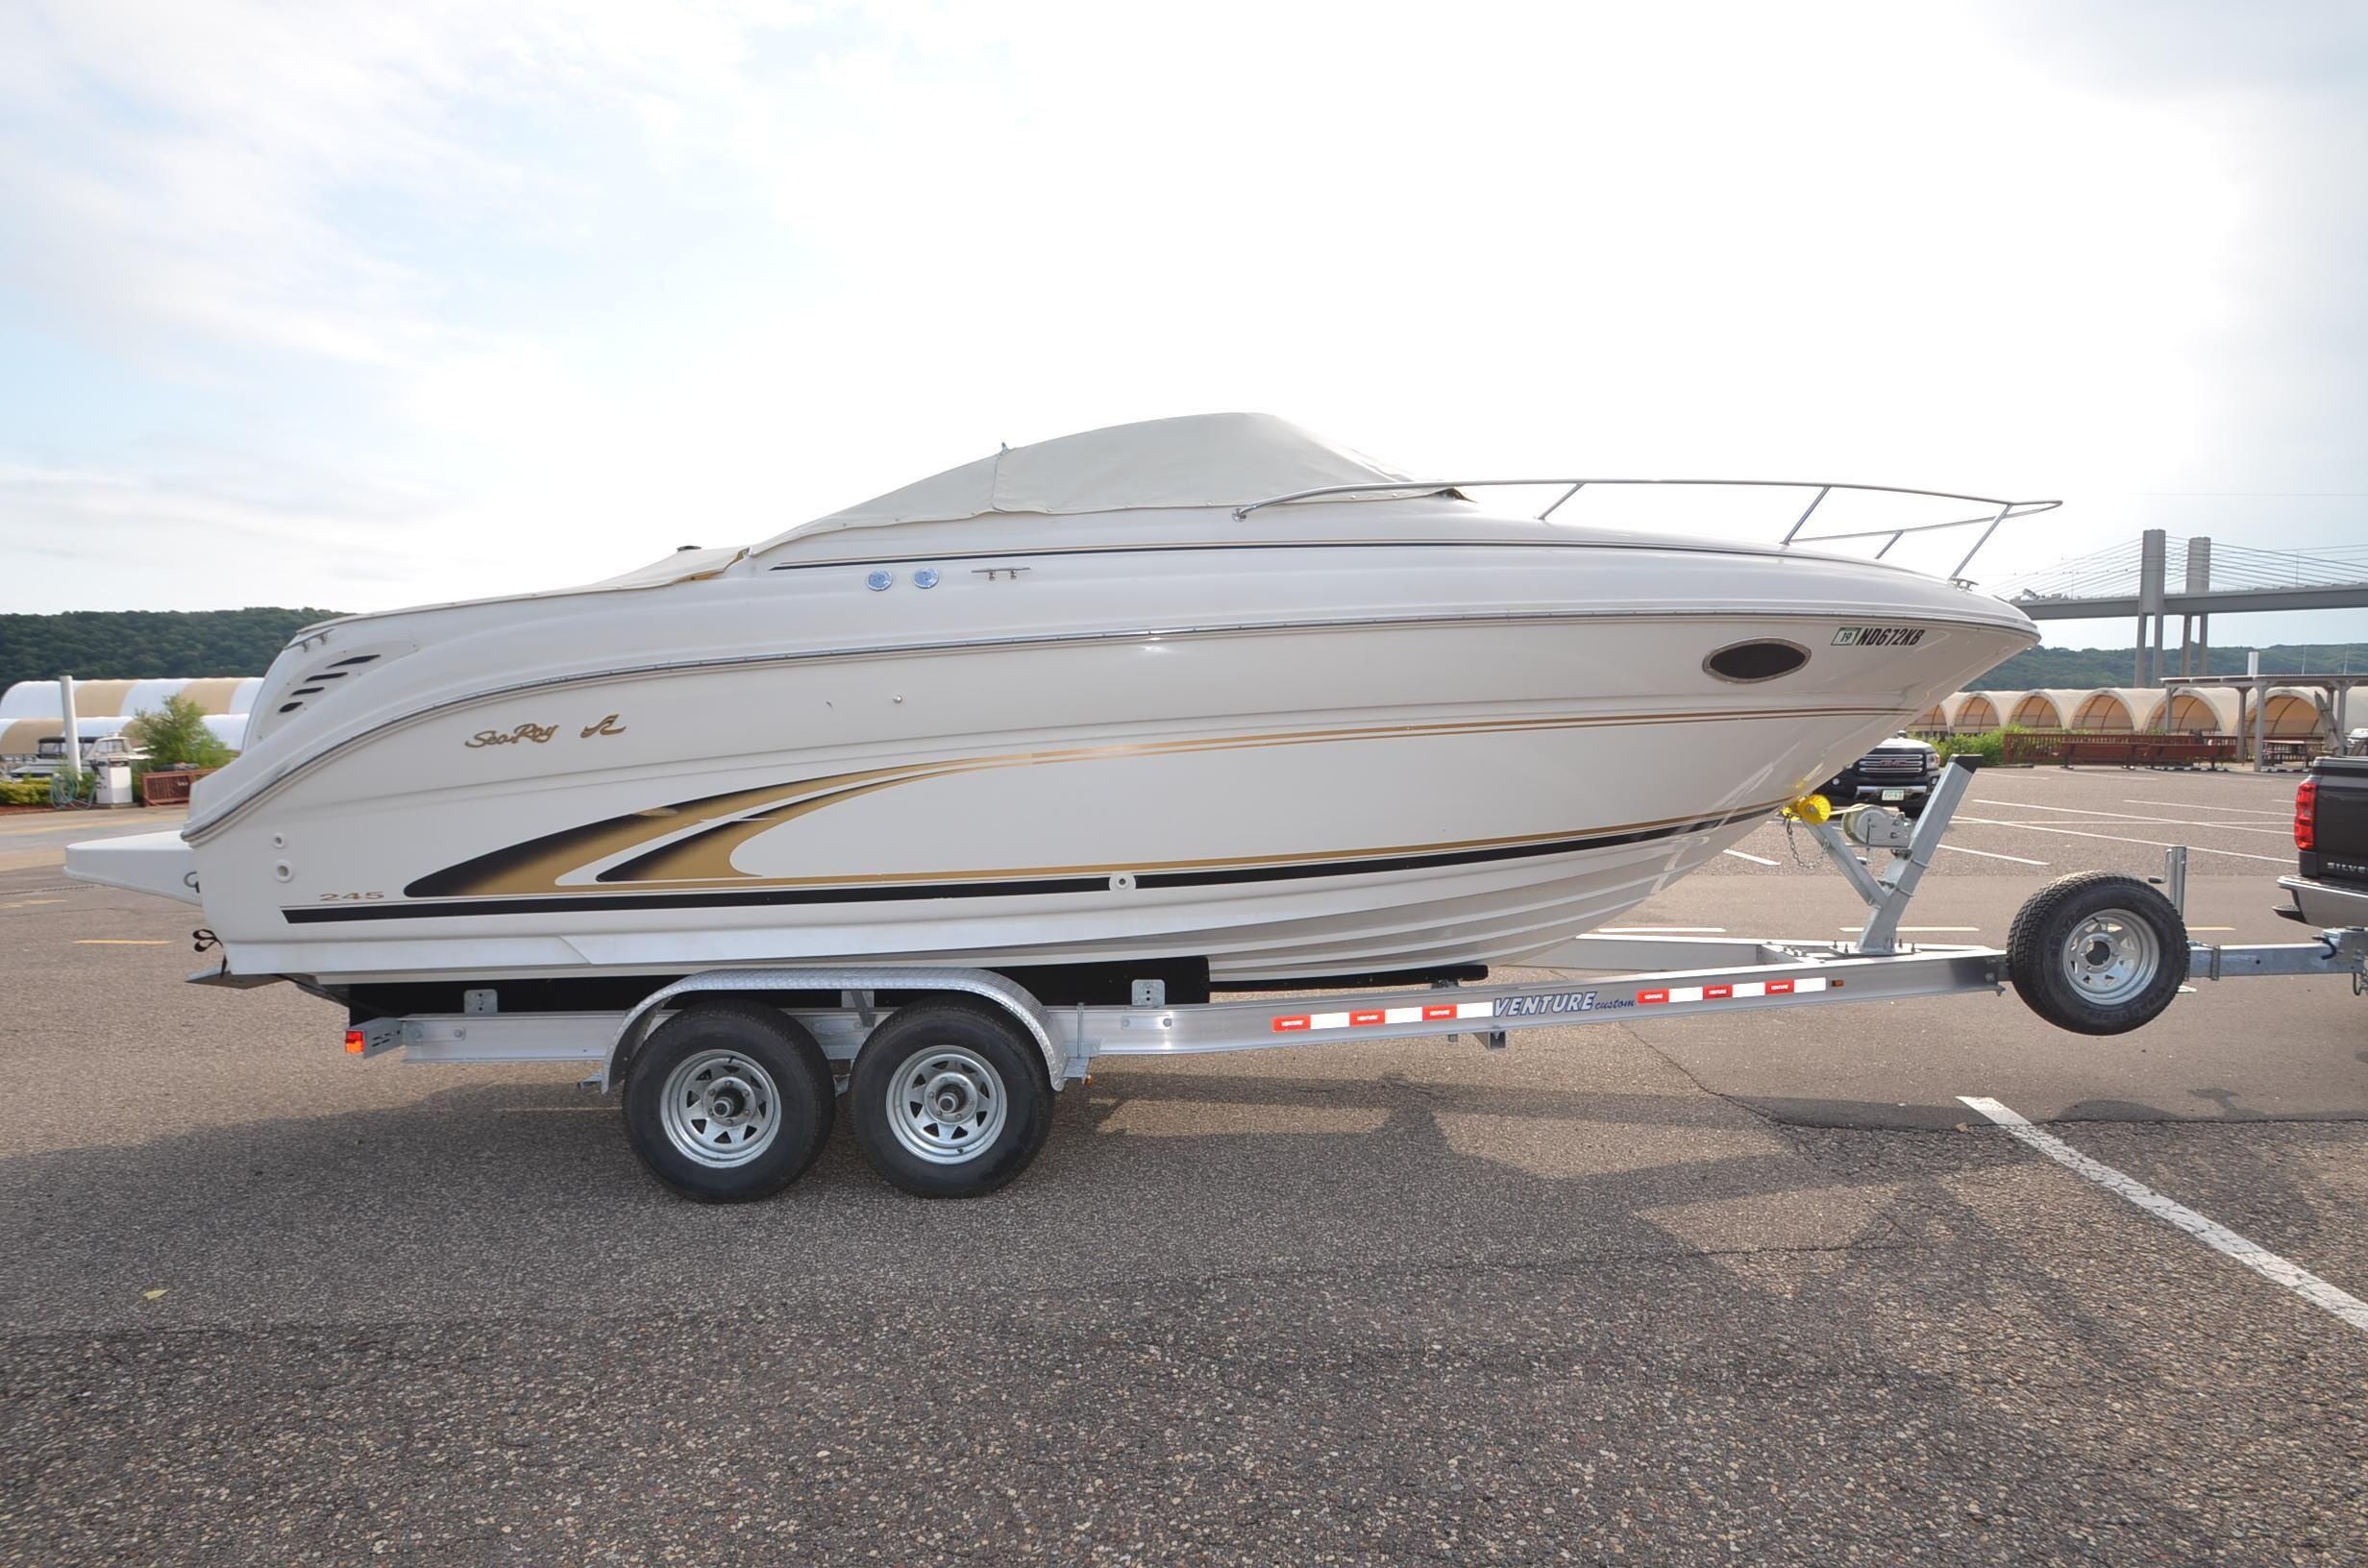 2001 Sea Ray 245 Weekender Power Boat For Sale Www